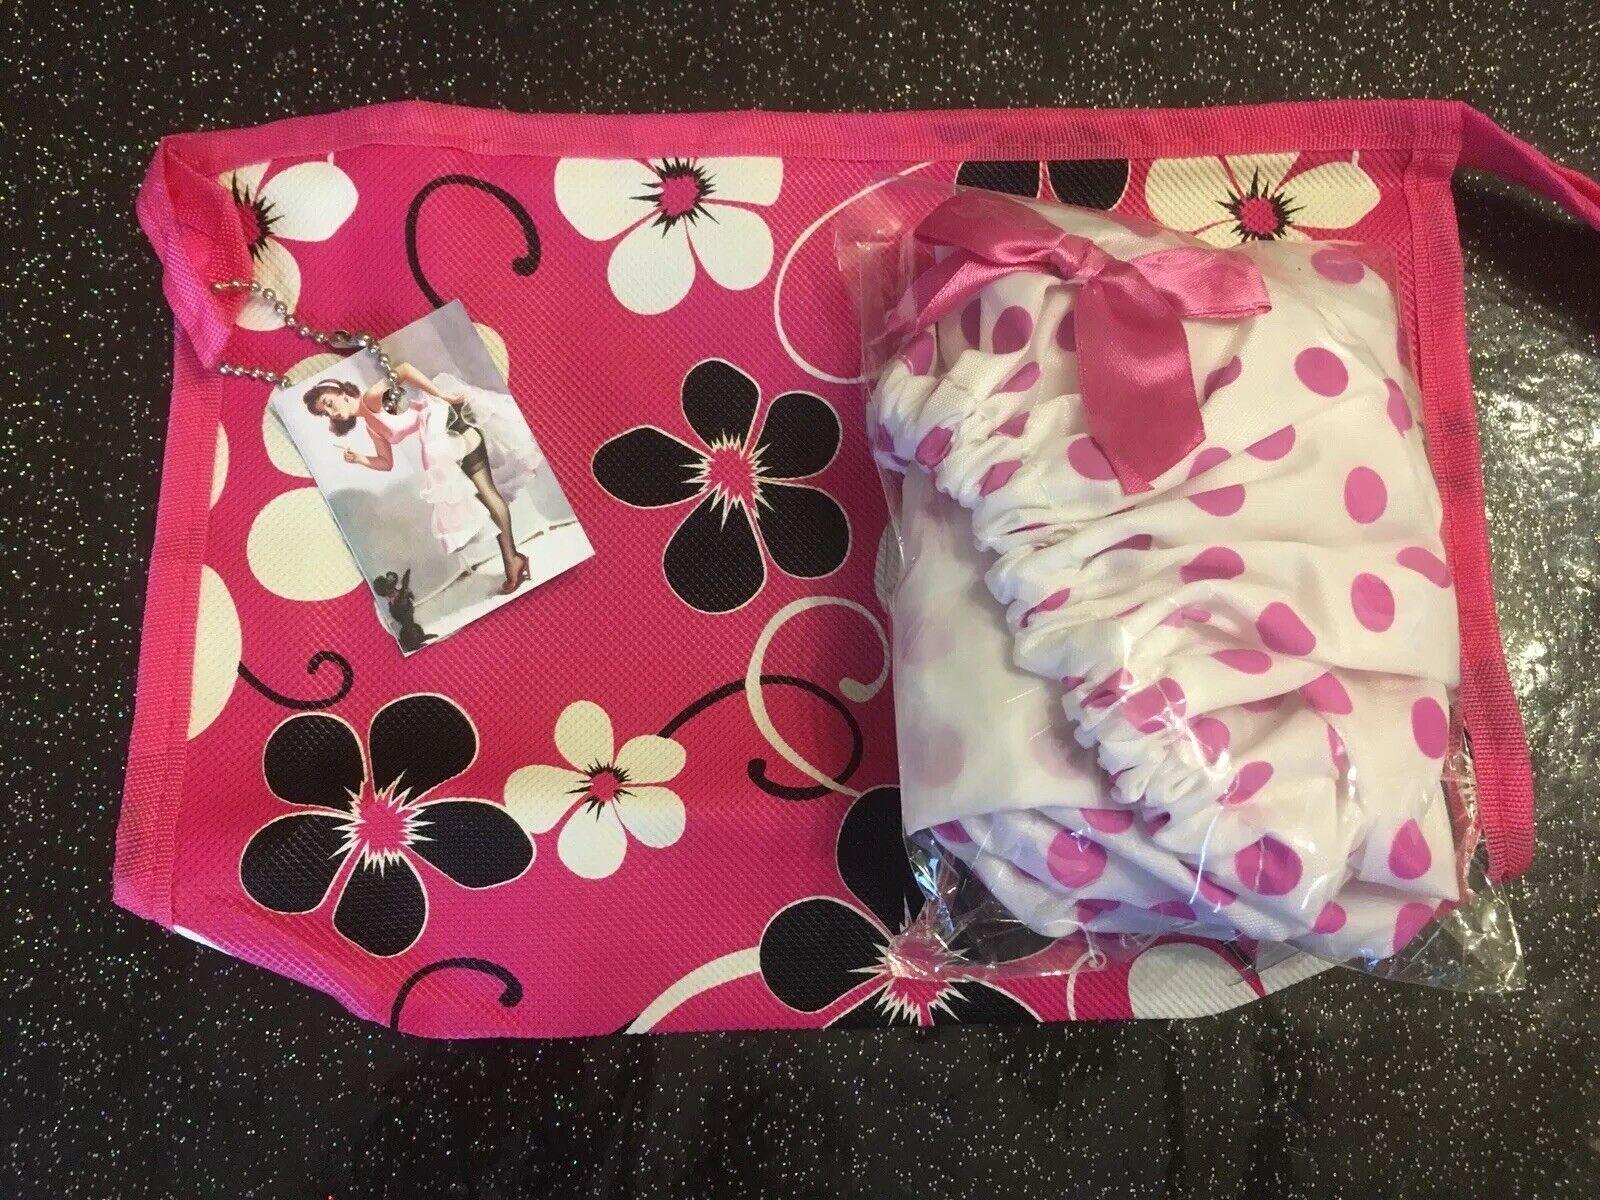 Retro Rockabilly Tropical Floral Toiletry Bag +Polka Dot 50's Shower Cap 2Pc Set